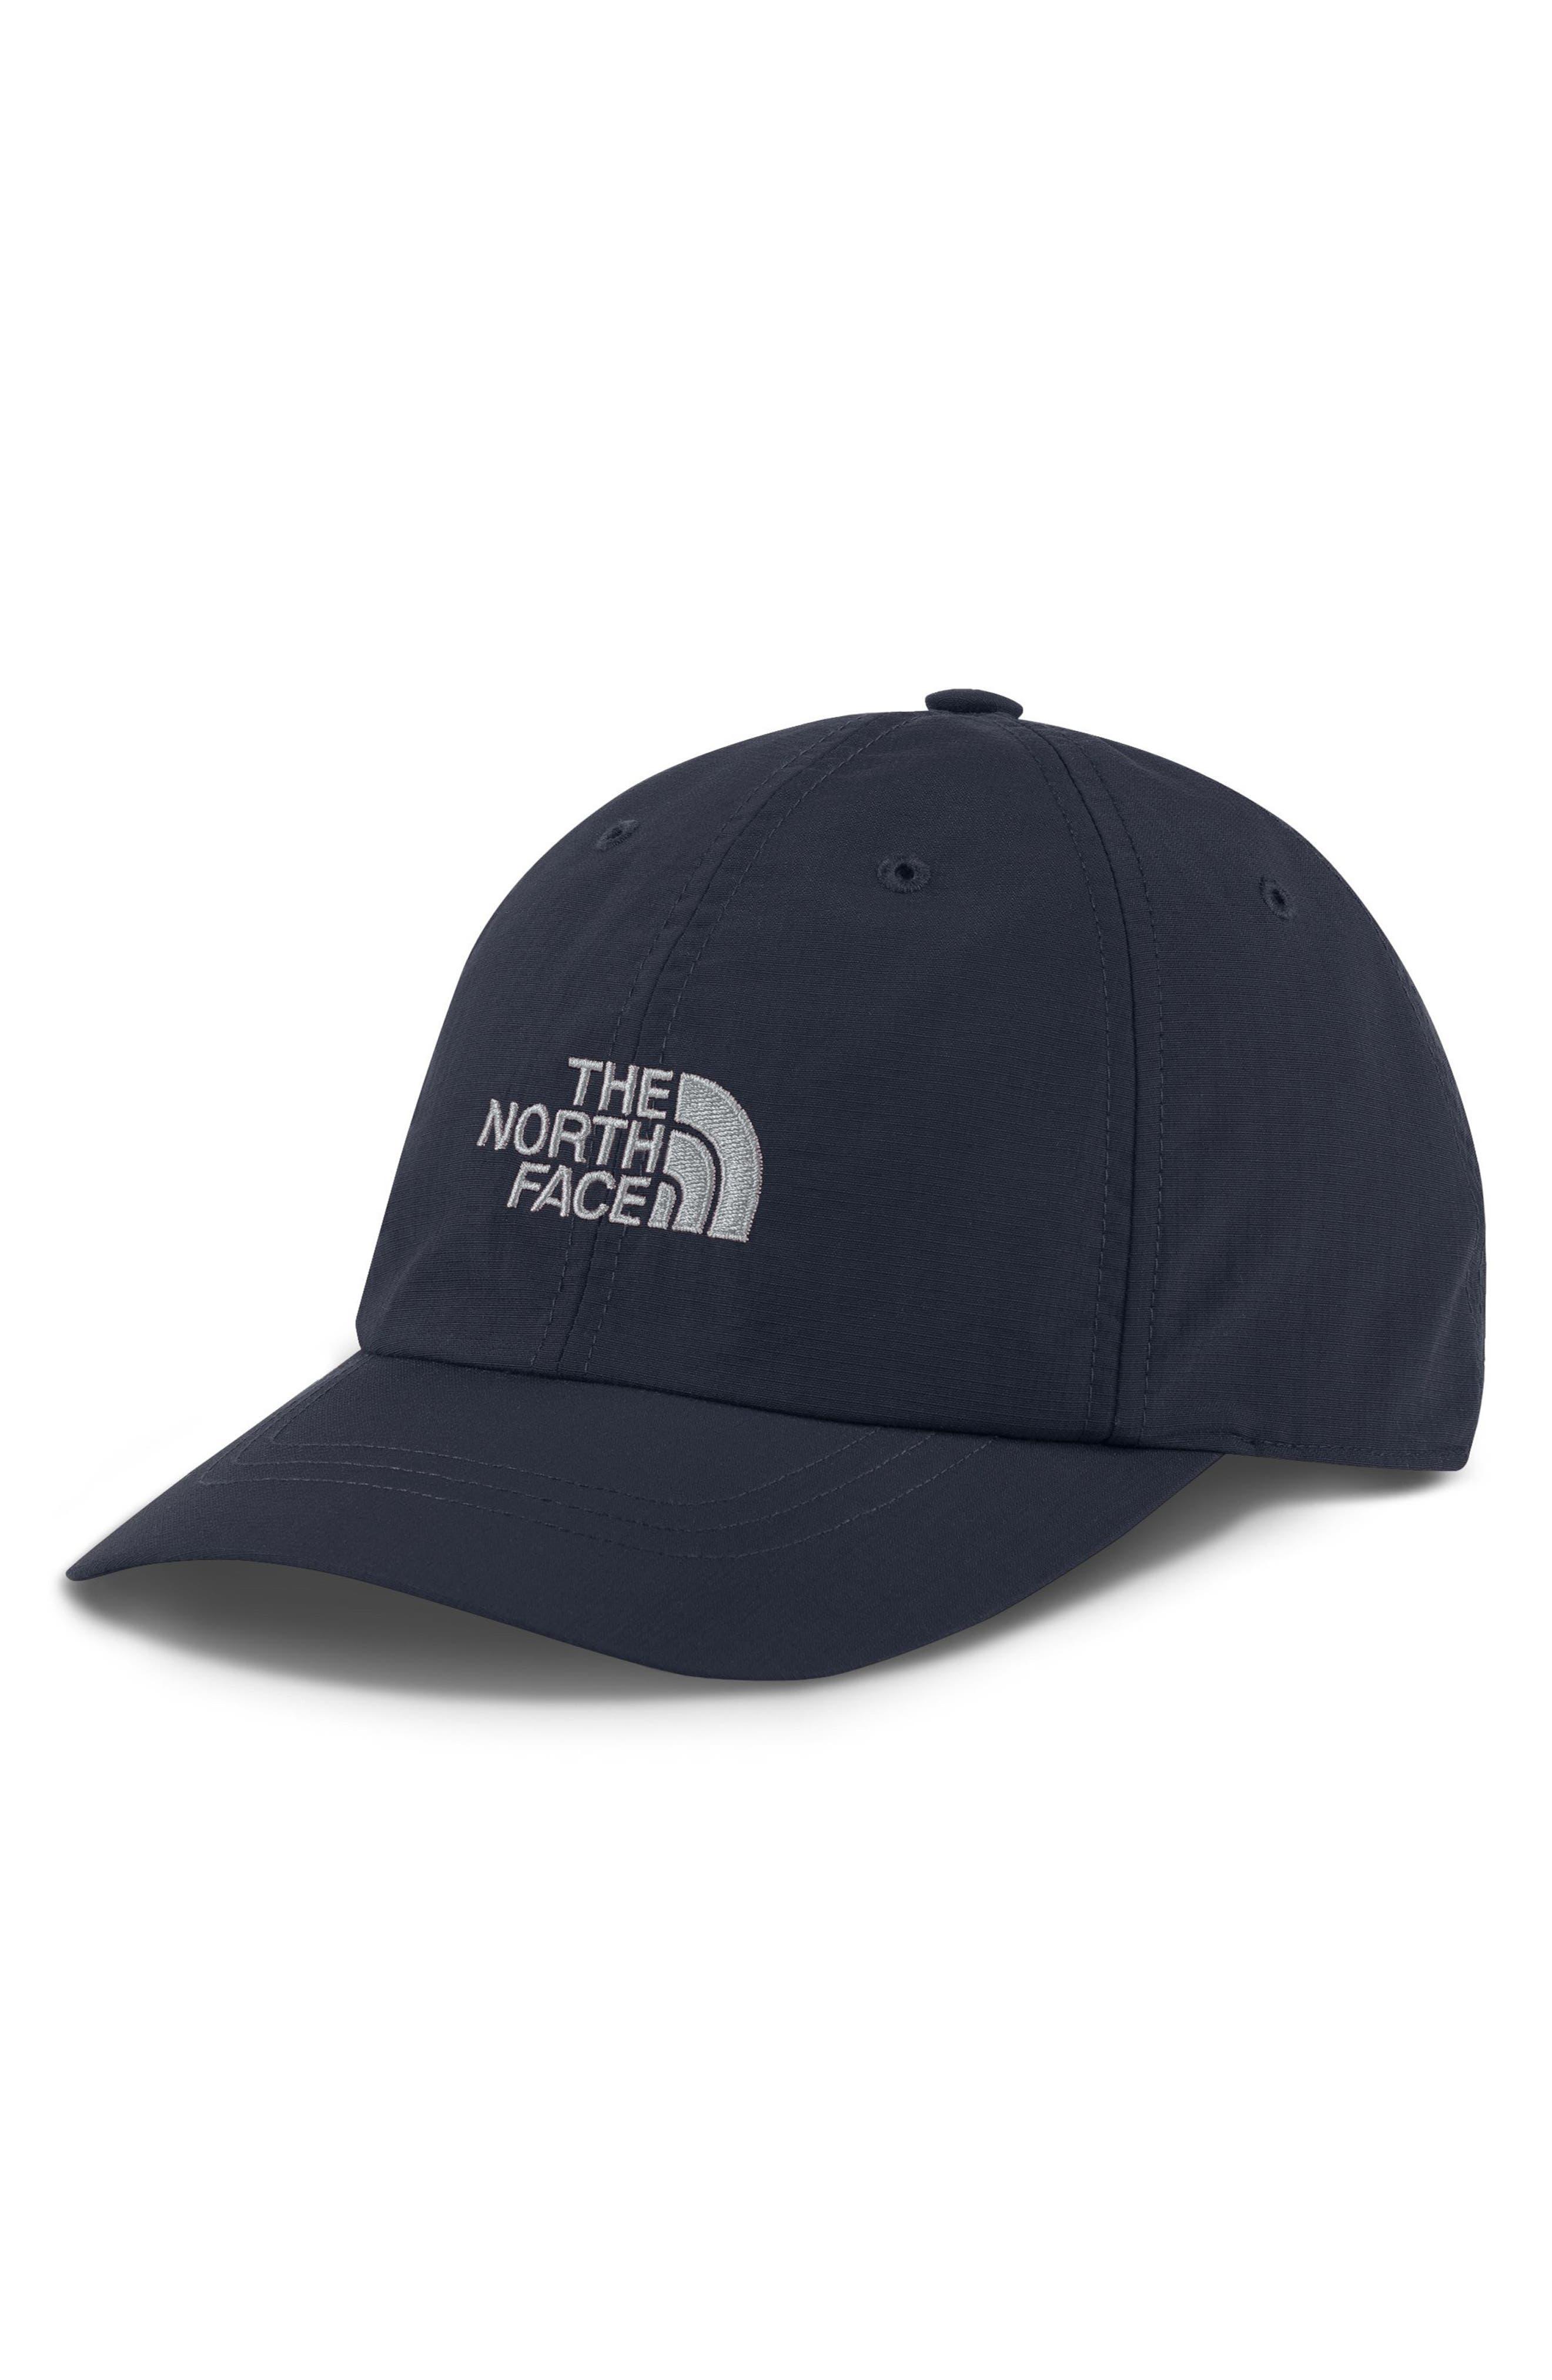 The North Face Horizon Baseball Cap